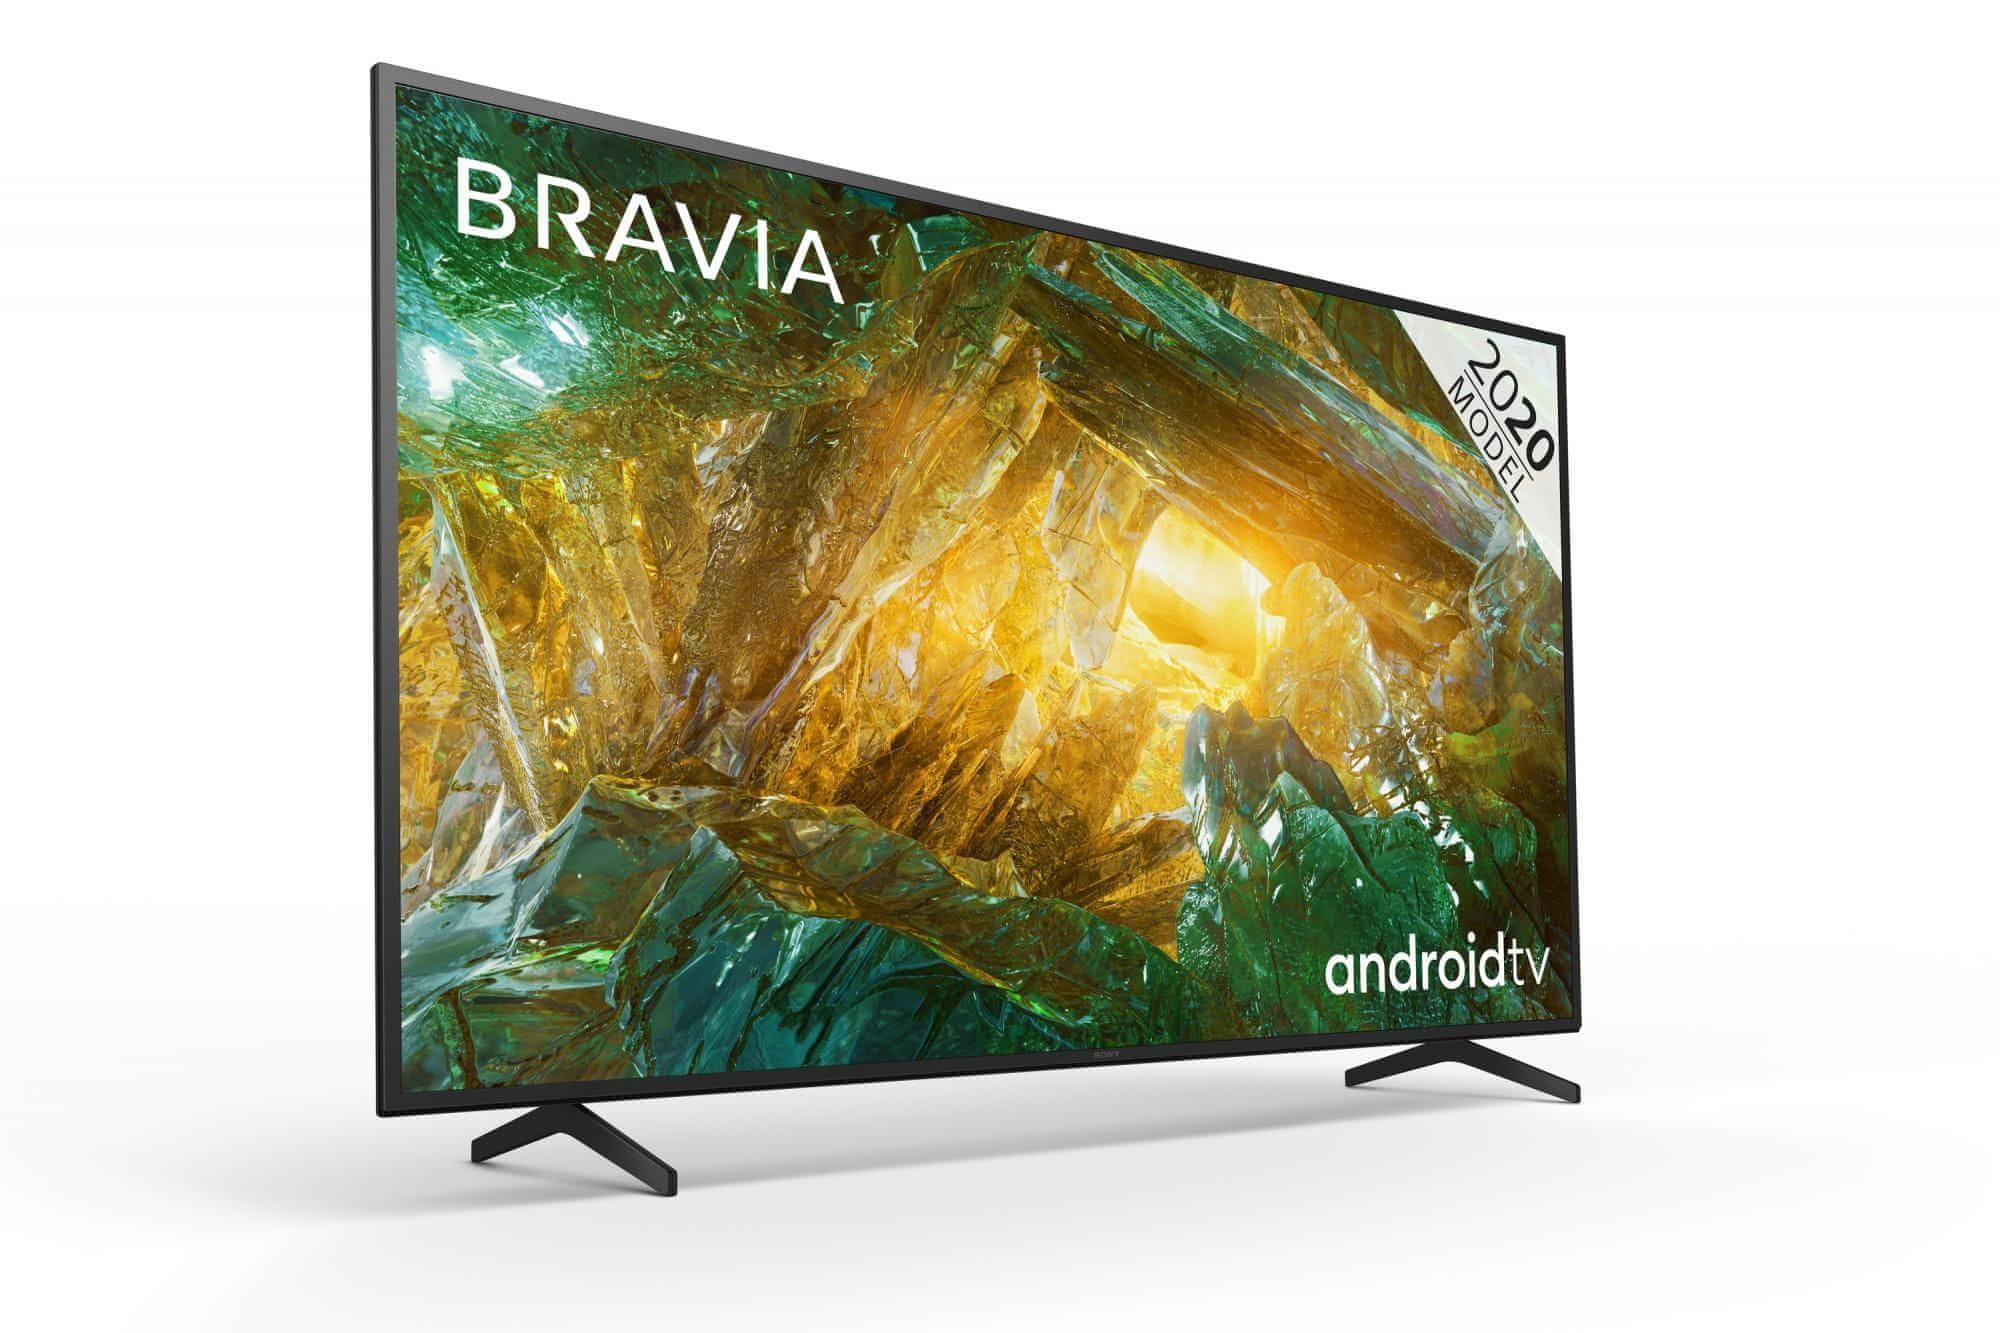 Vrhunska ločljivost 4K Ultra HD